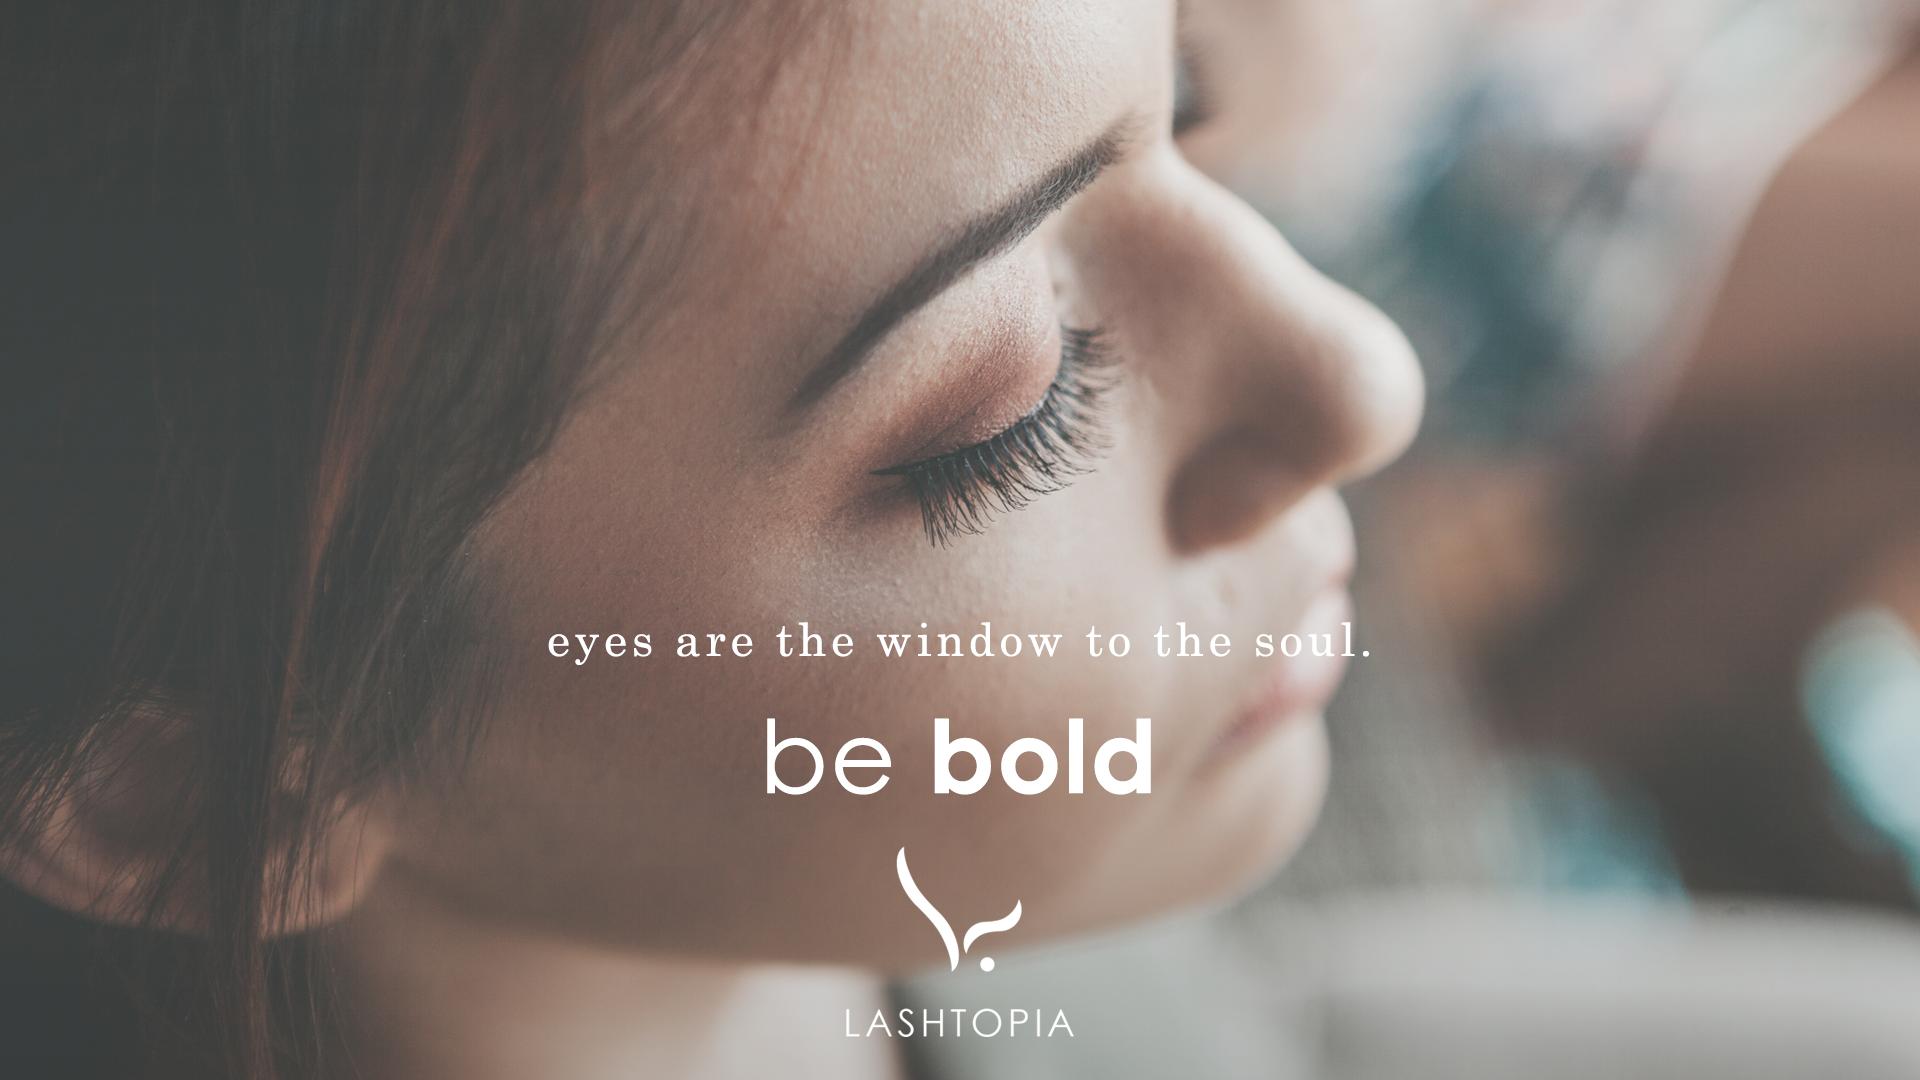 Lashtopia eyelash boutique logo and branding project